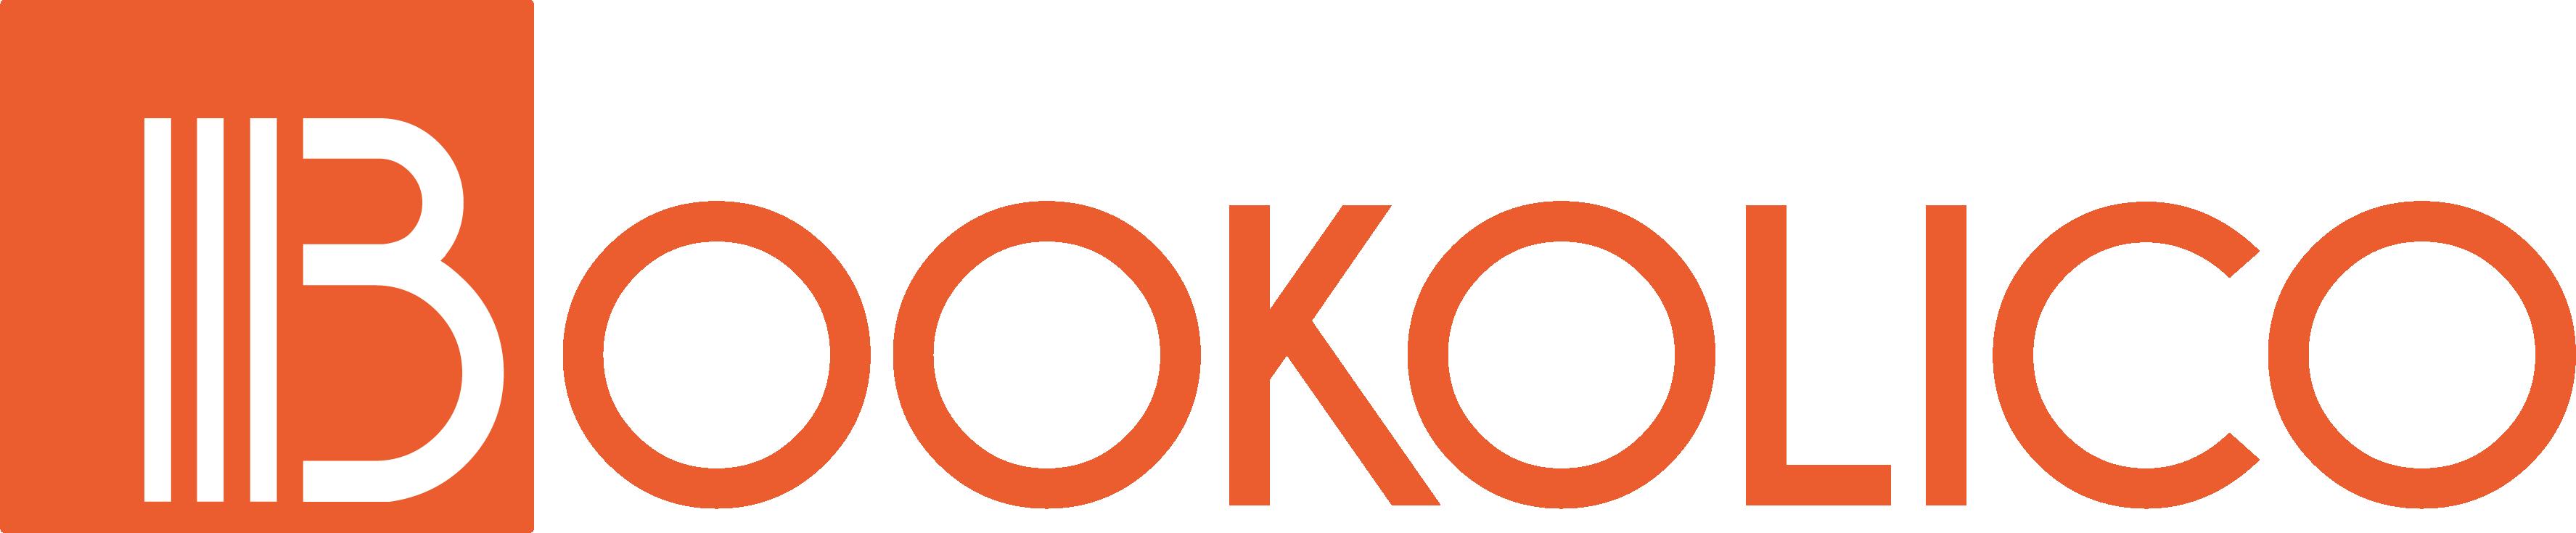 booklico_logo_arancio-h